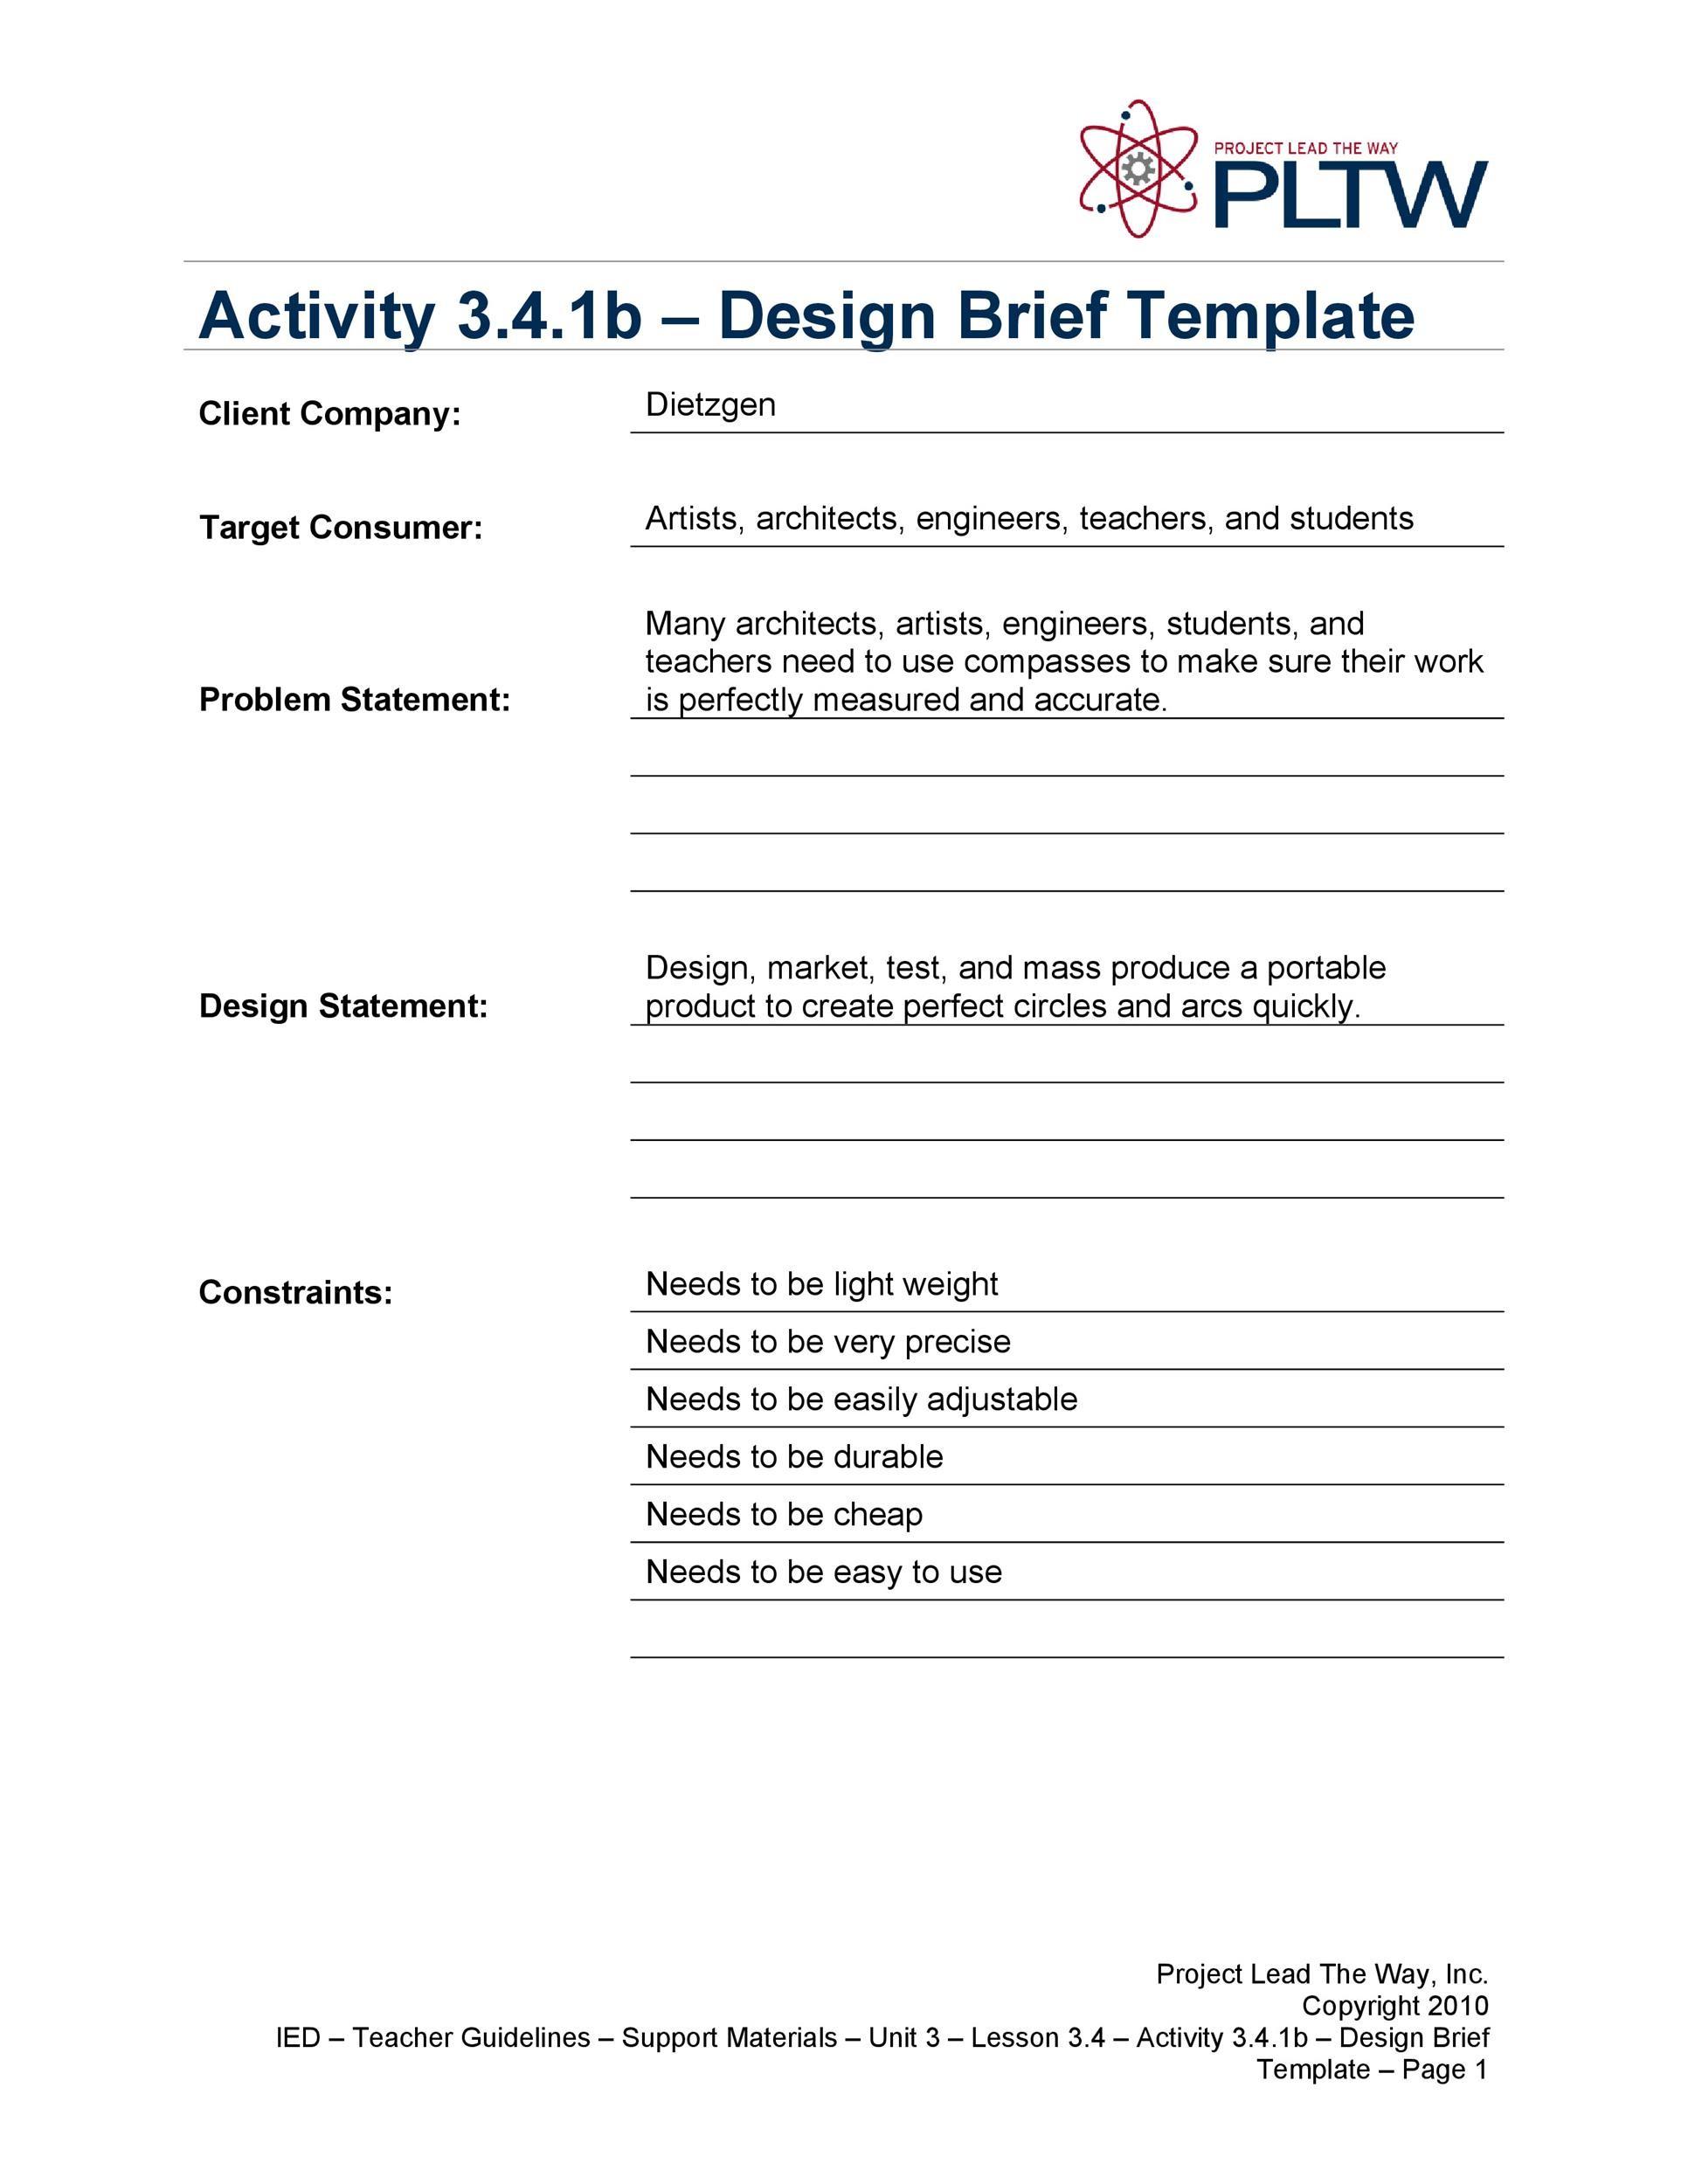 Free design brief template 23